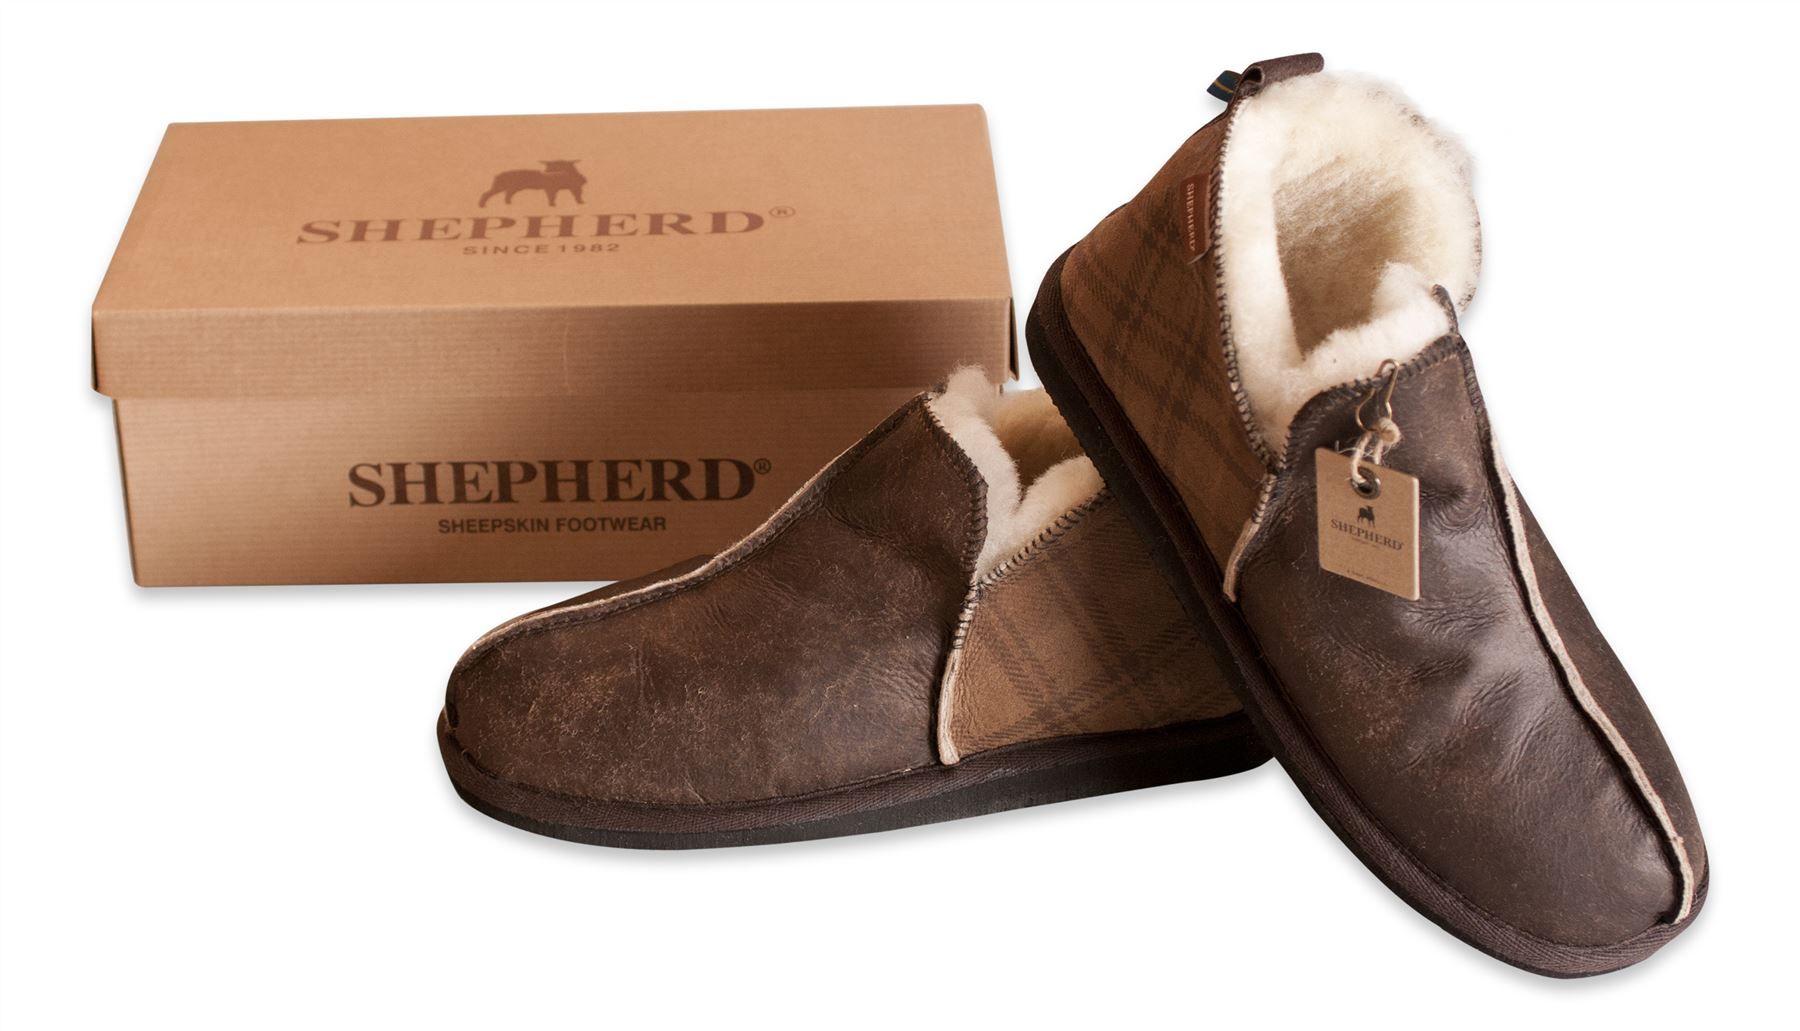 4c3ee7734b92 Shepherd Mens Genuine Sheepskin Slippers Boots Shoes Hard Sole ANTON 4921